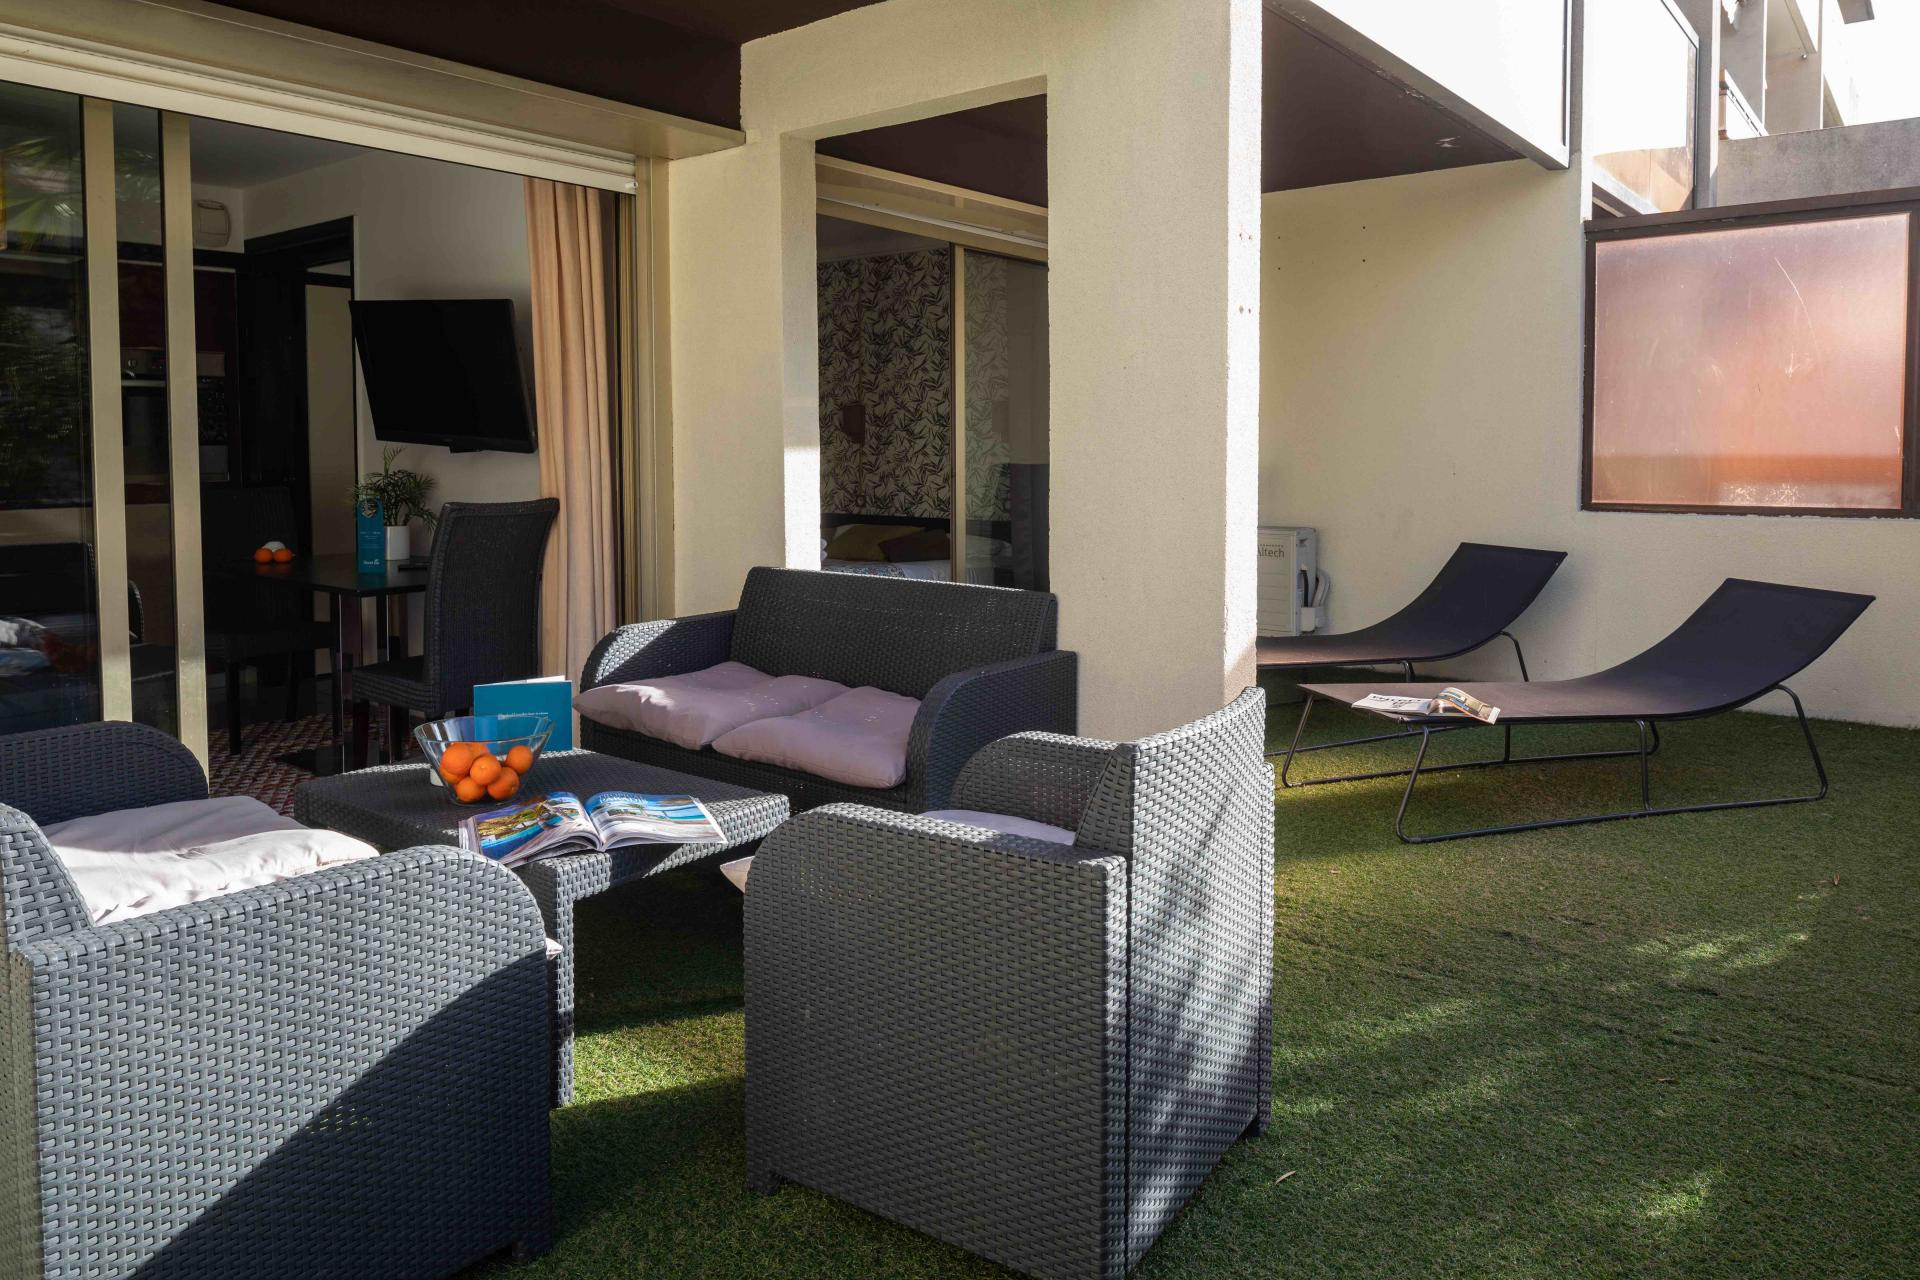 Terrace at Avenue Alexandre Apartments, Juan-les-Pins, Antibes